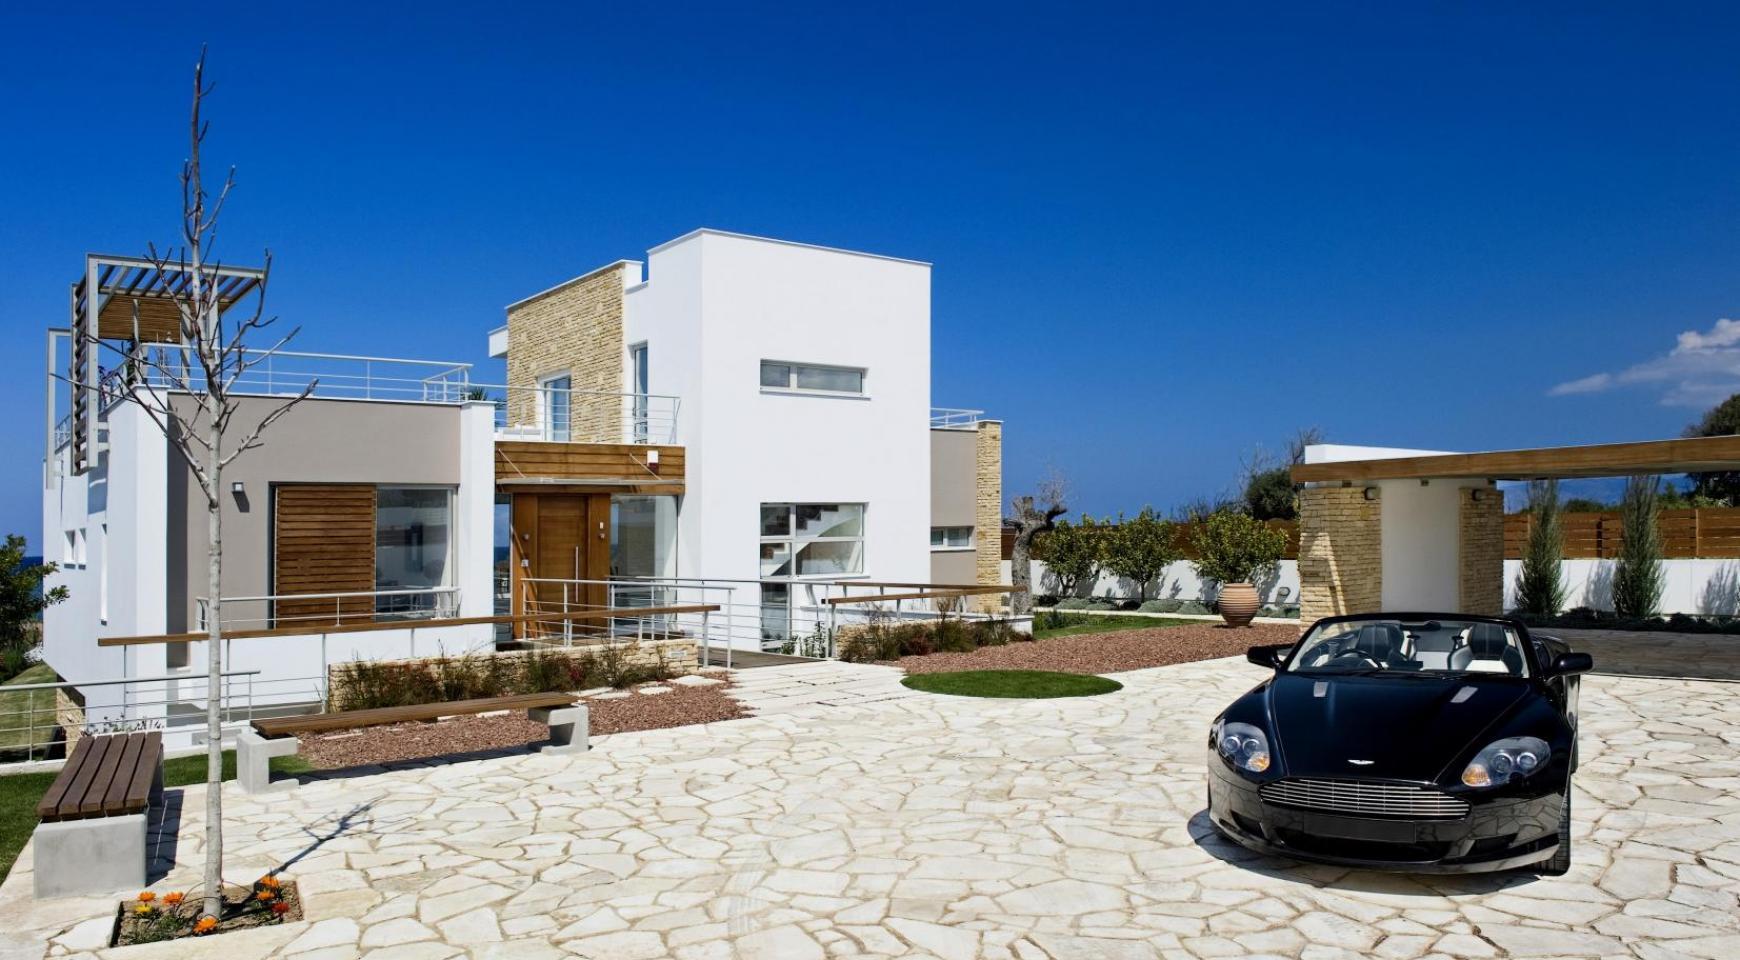 4 Bedroom Villa with Sea Views near Latsi - 1